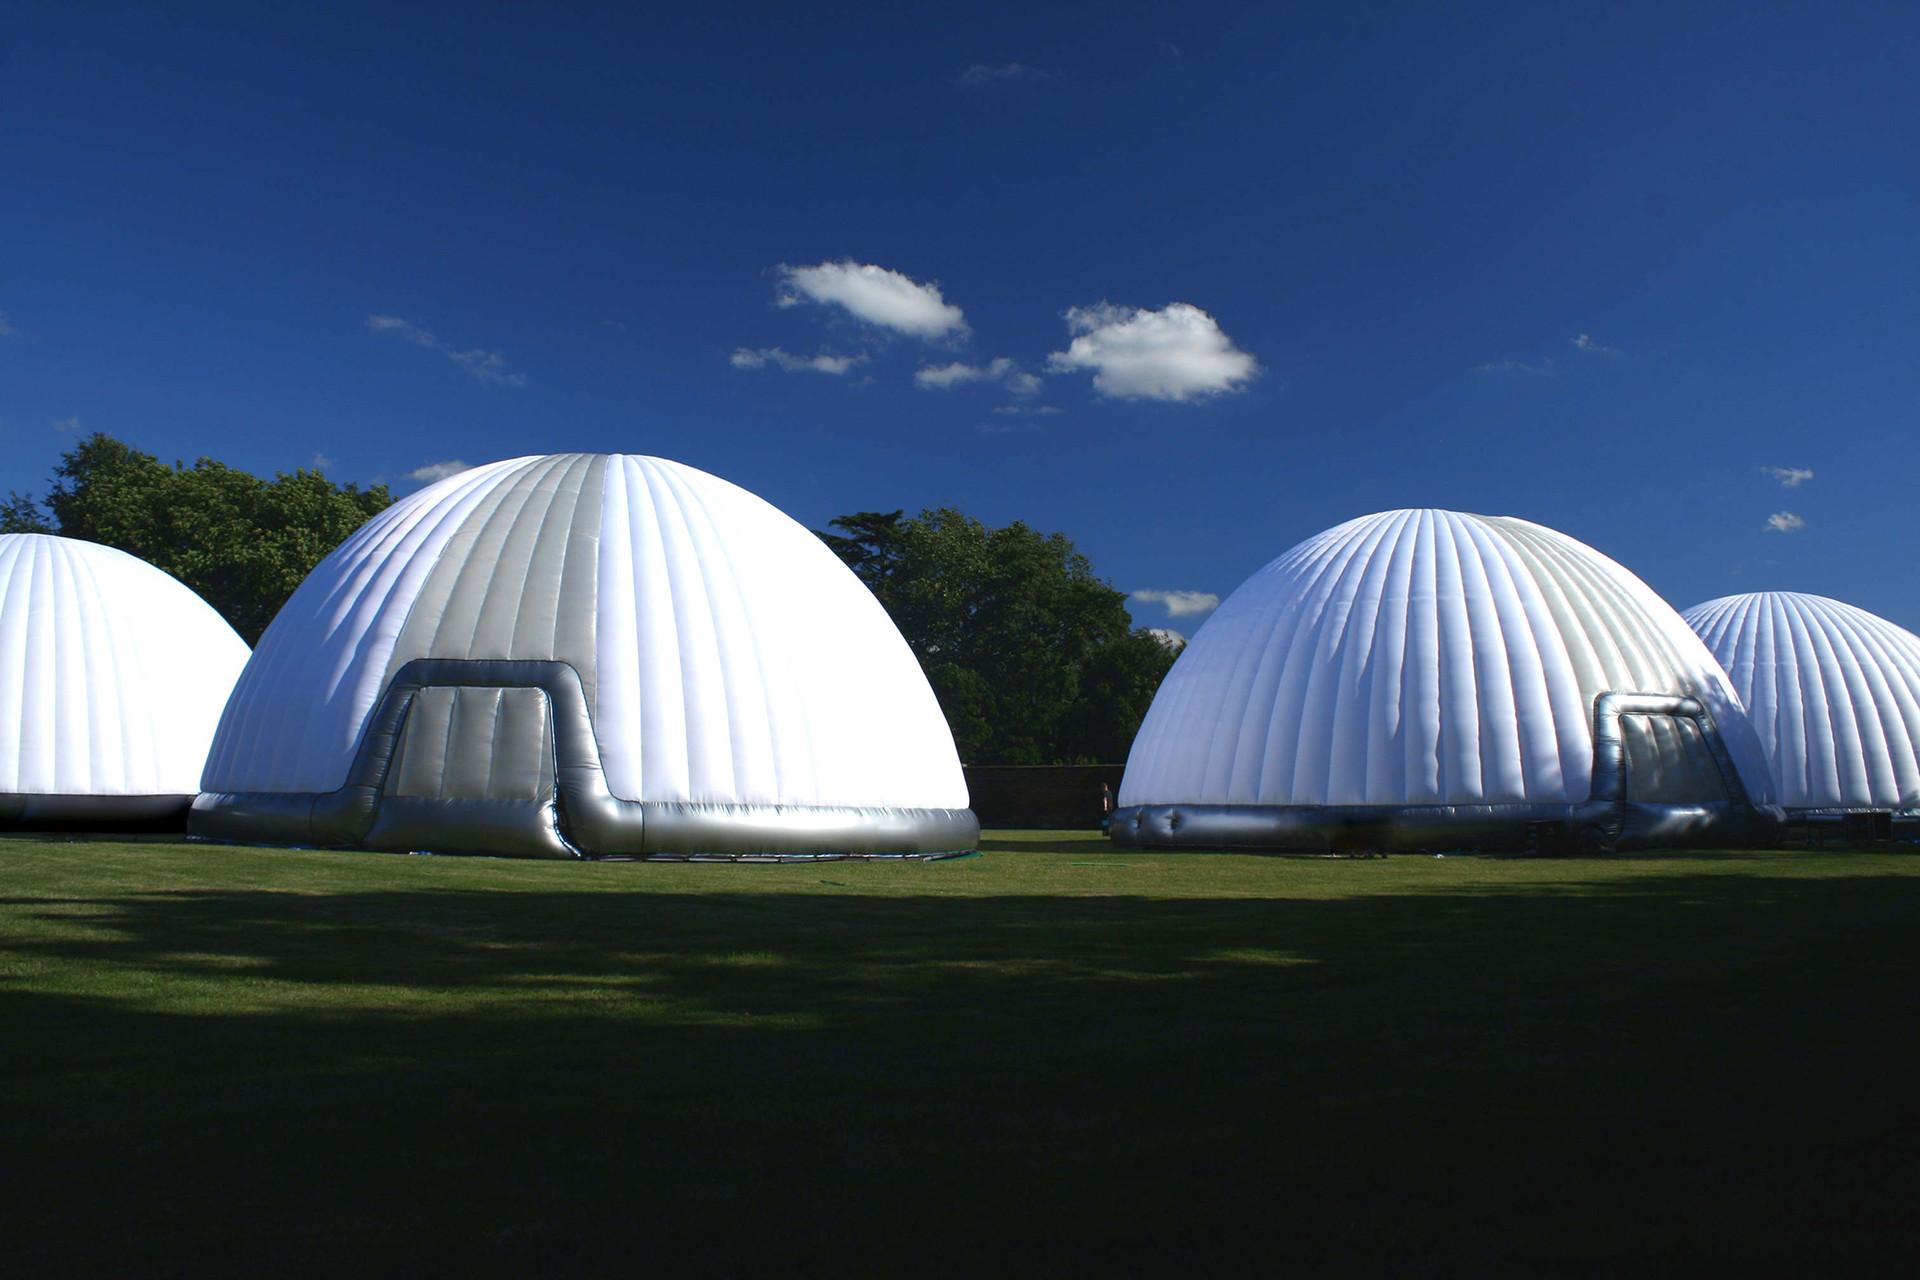 Explore our Blowup Event Tents